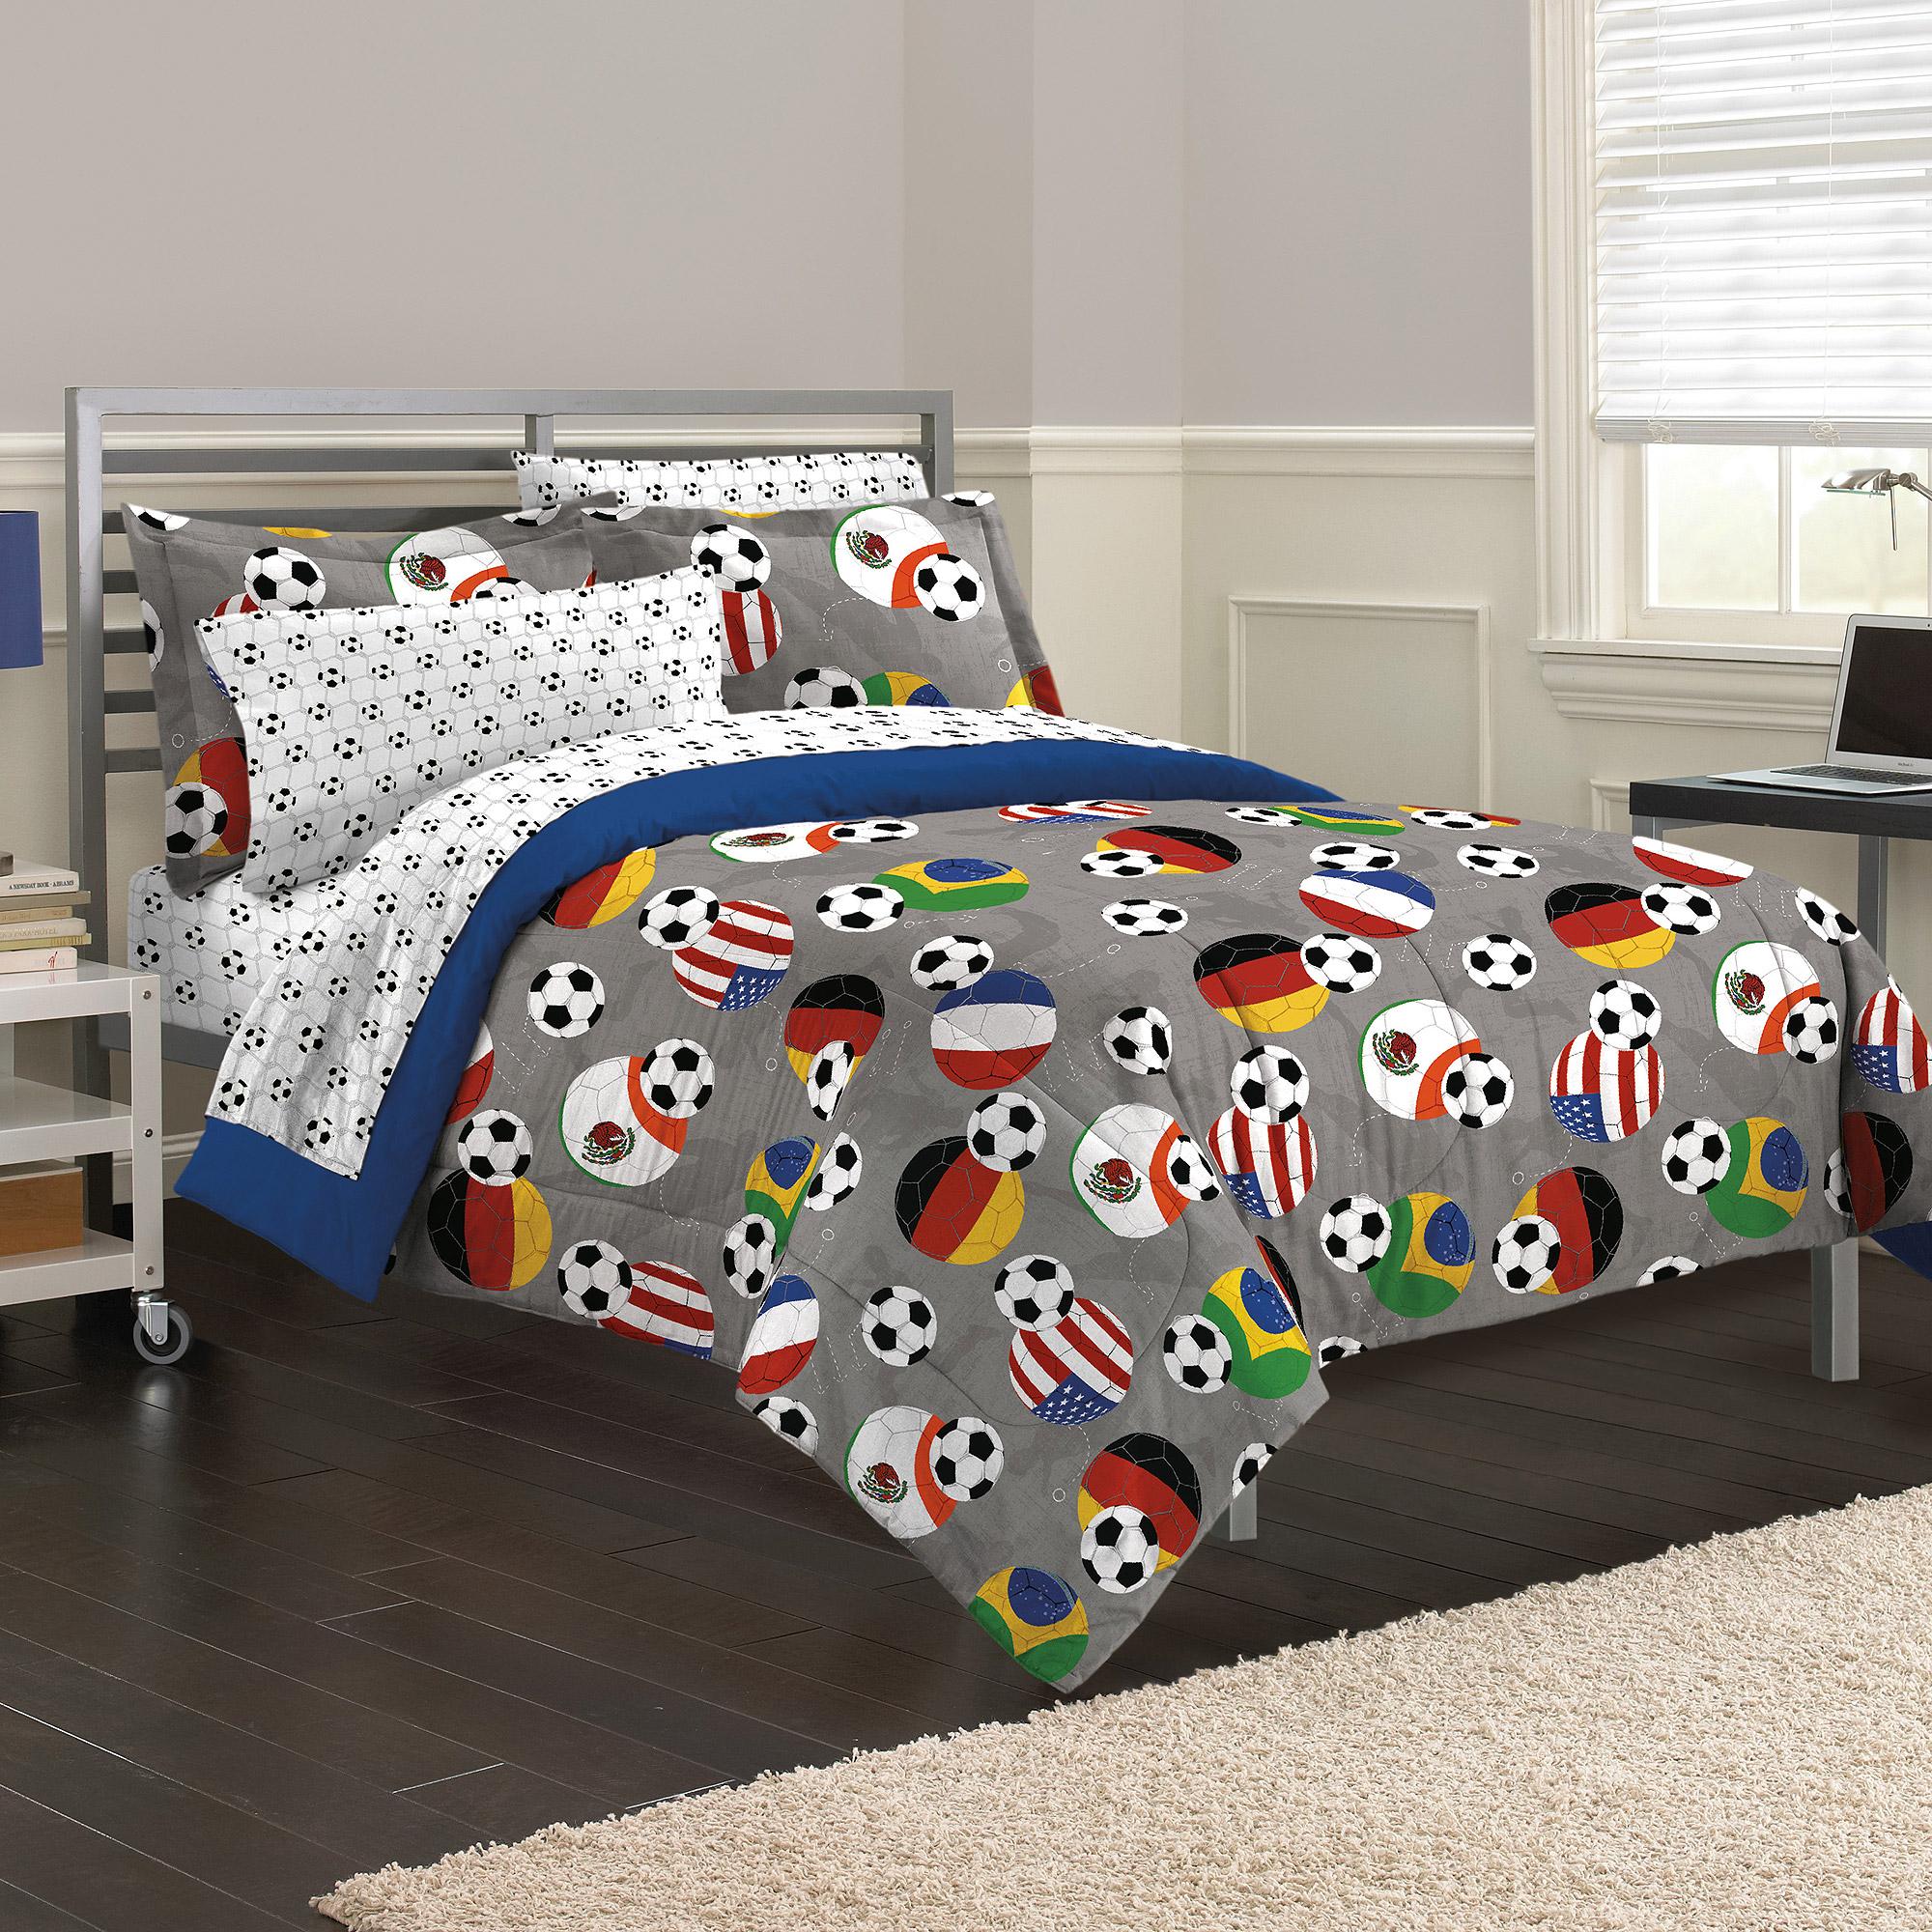 My Room Soccer Fever Mini Bed In A Bag Bedding Set